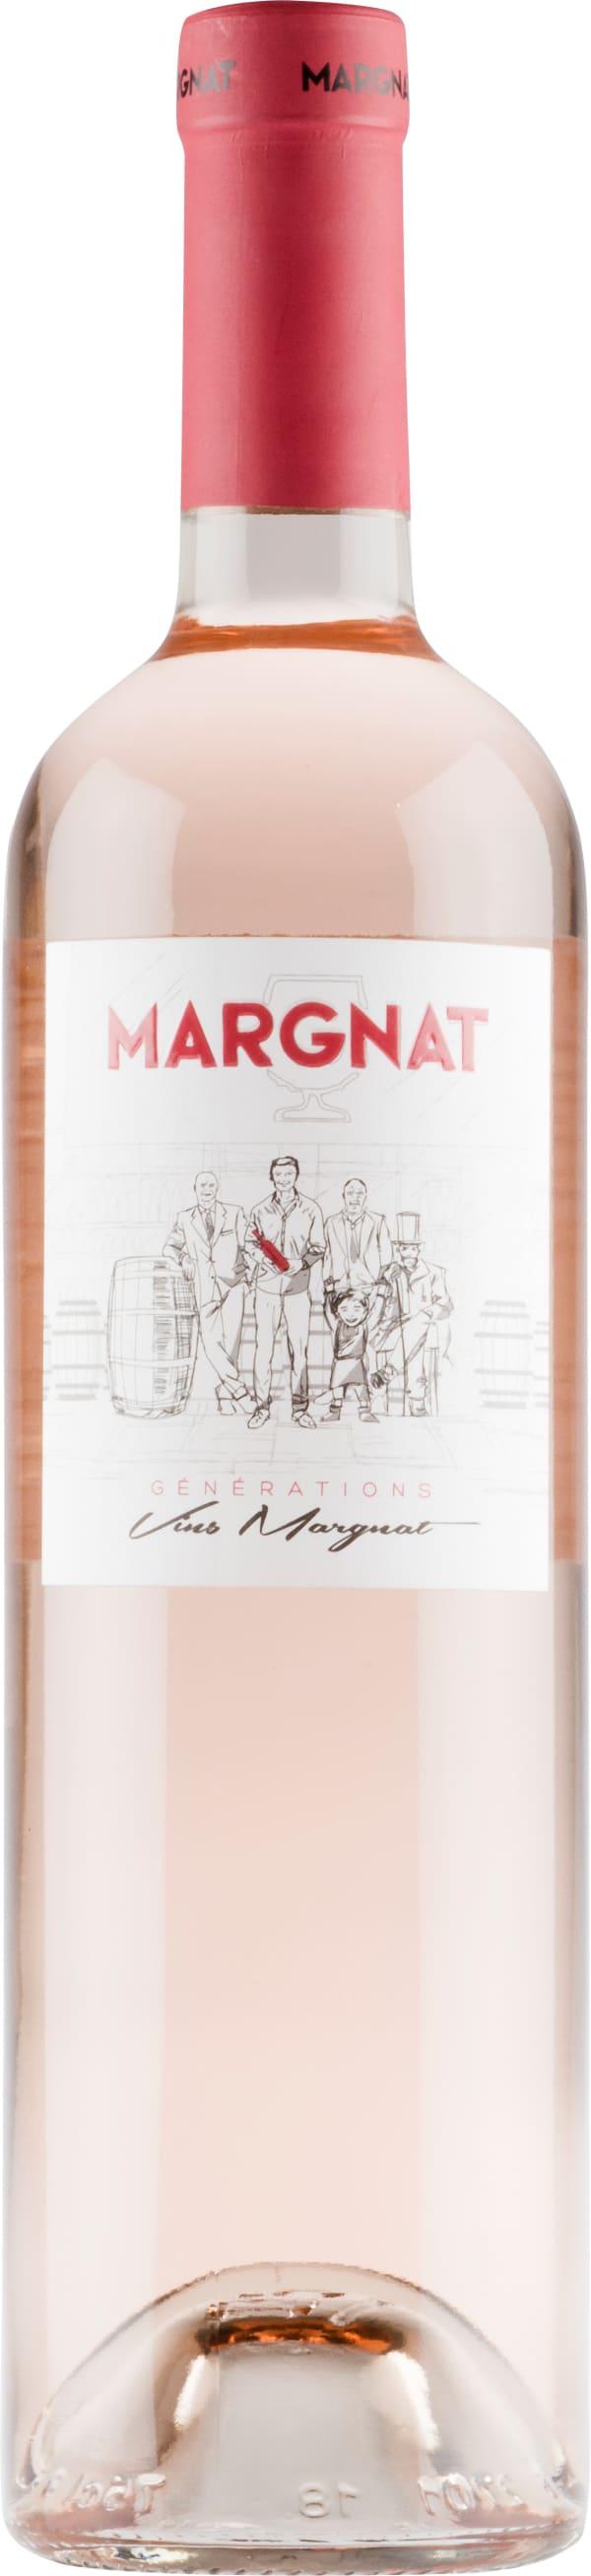 Margnat Generation 2019